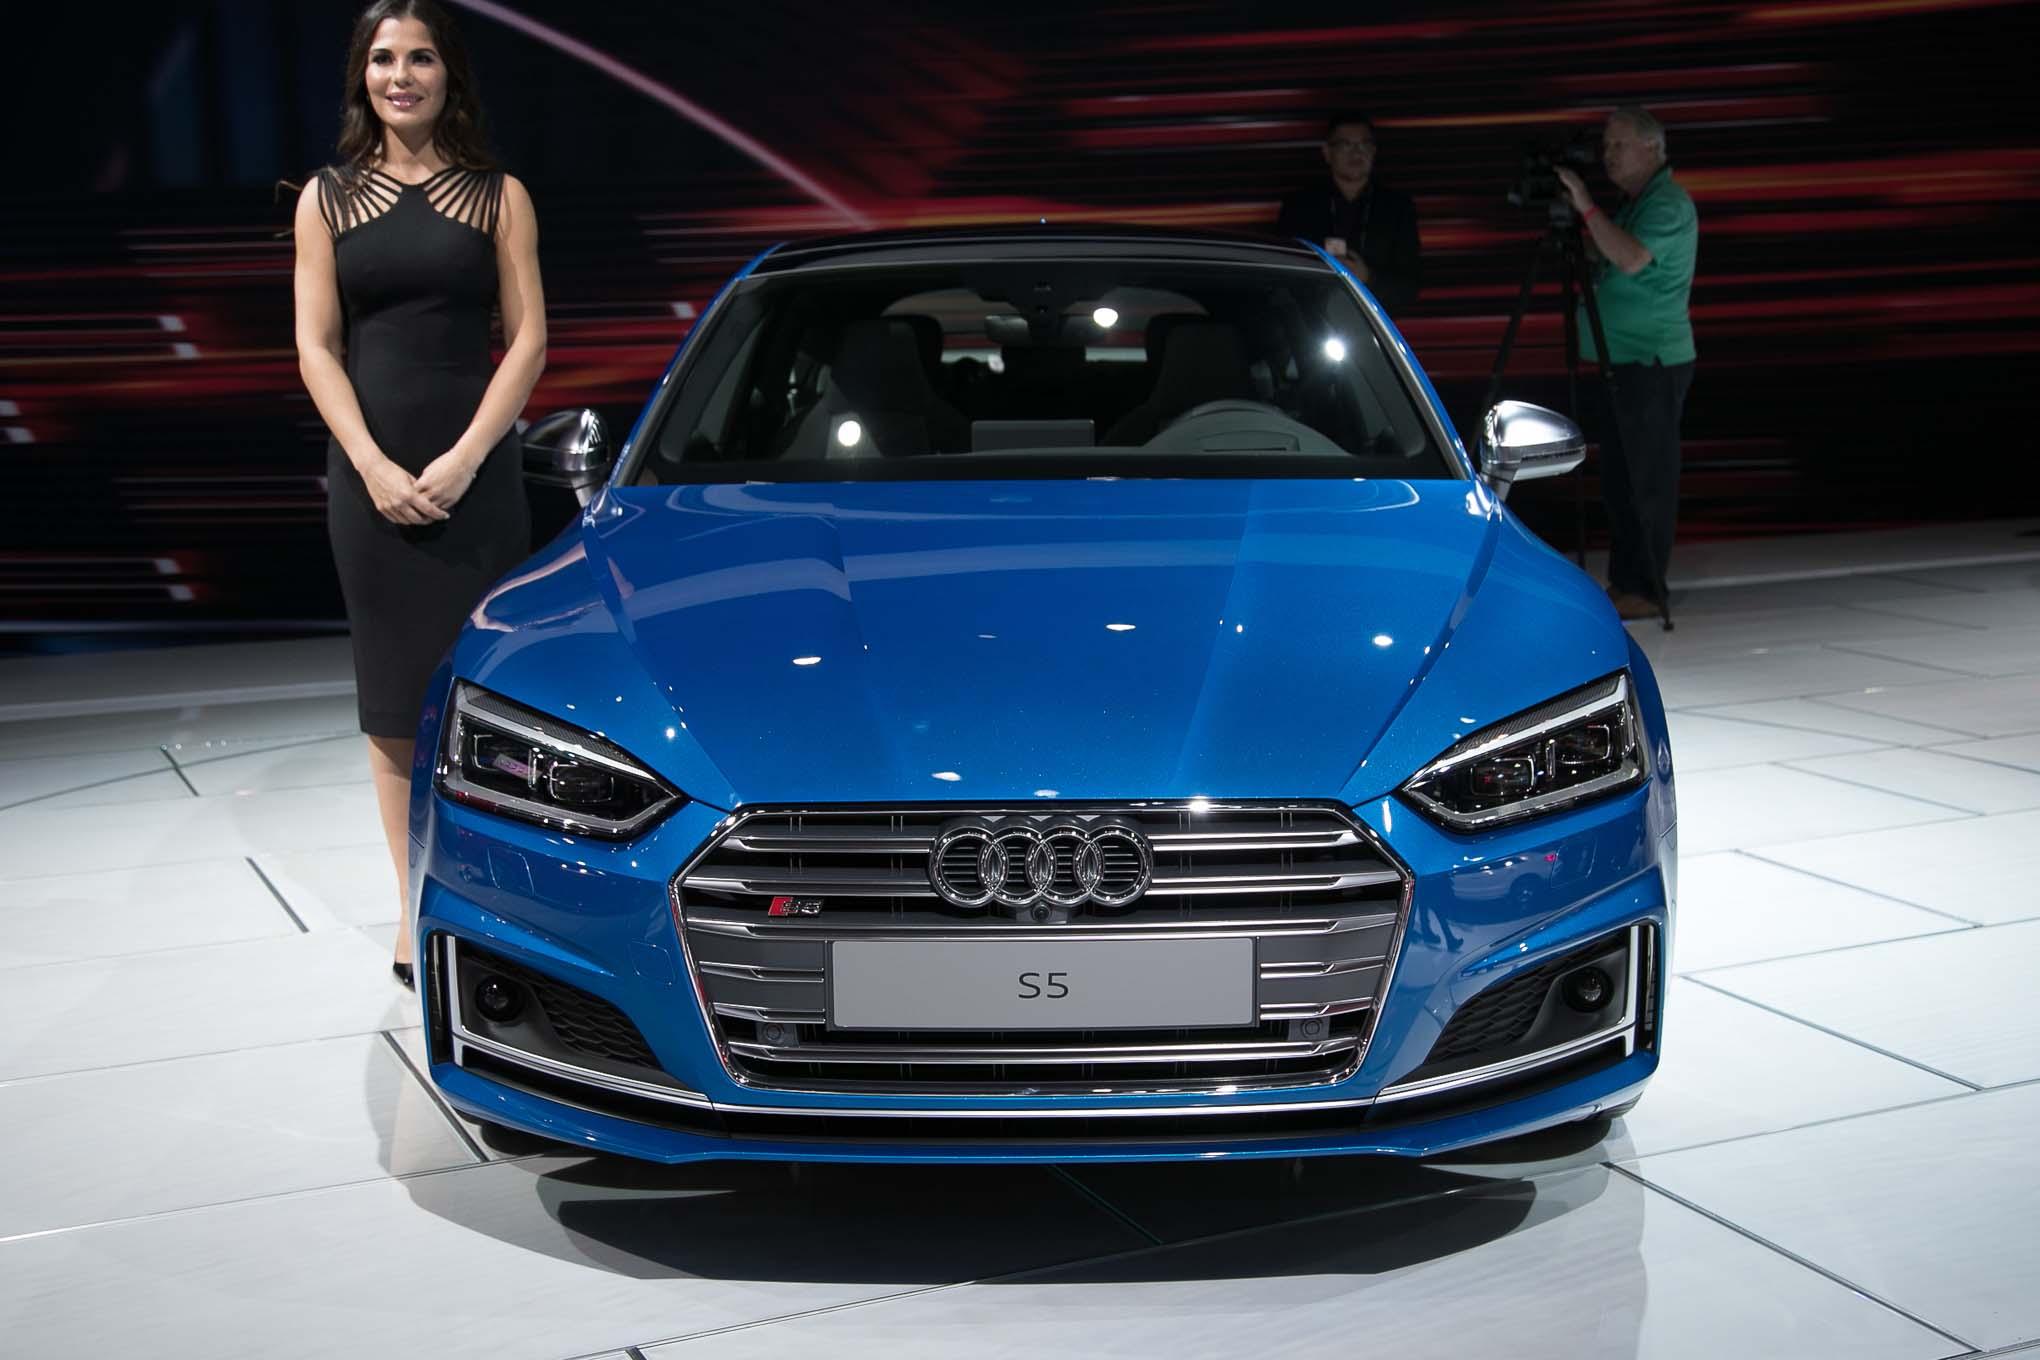 2018-Audi-S5-Sportback-front-end-1